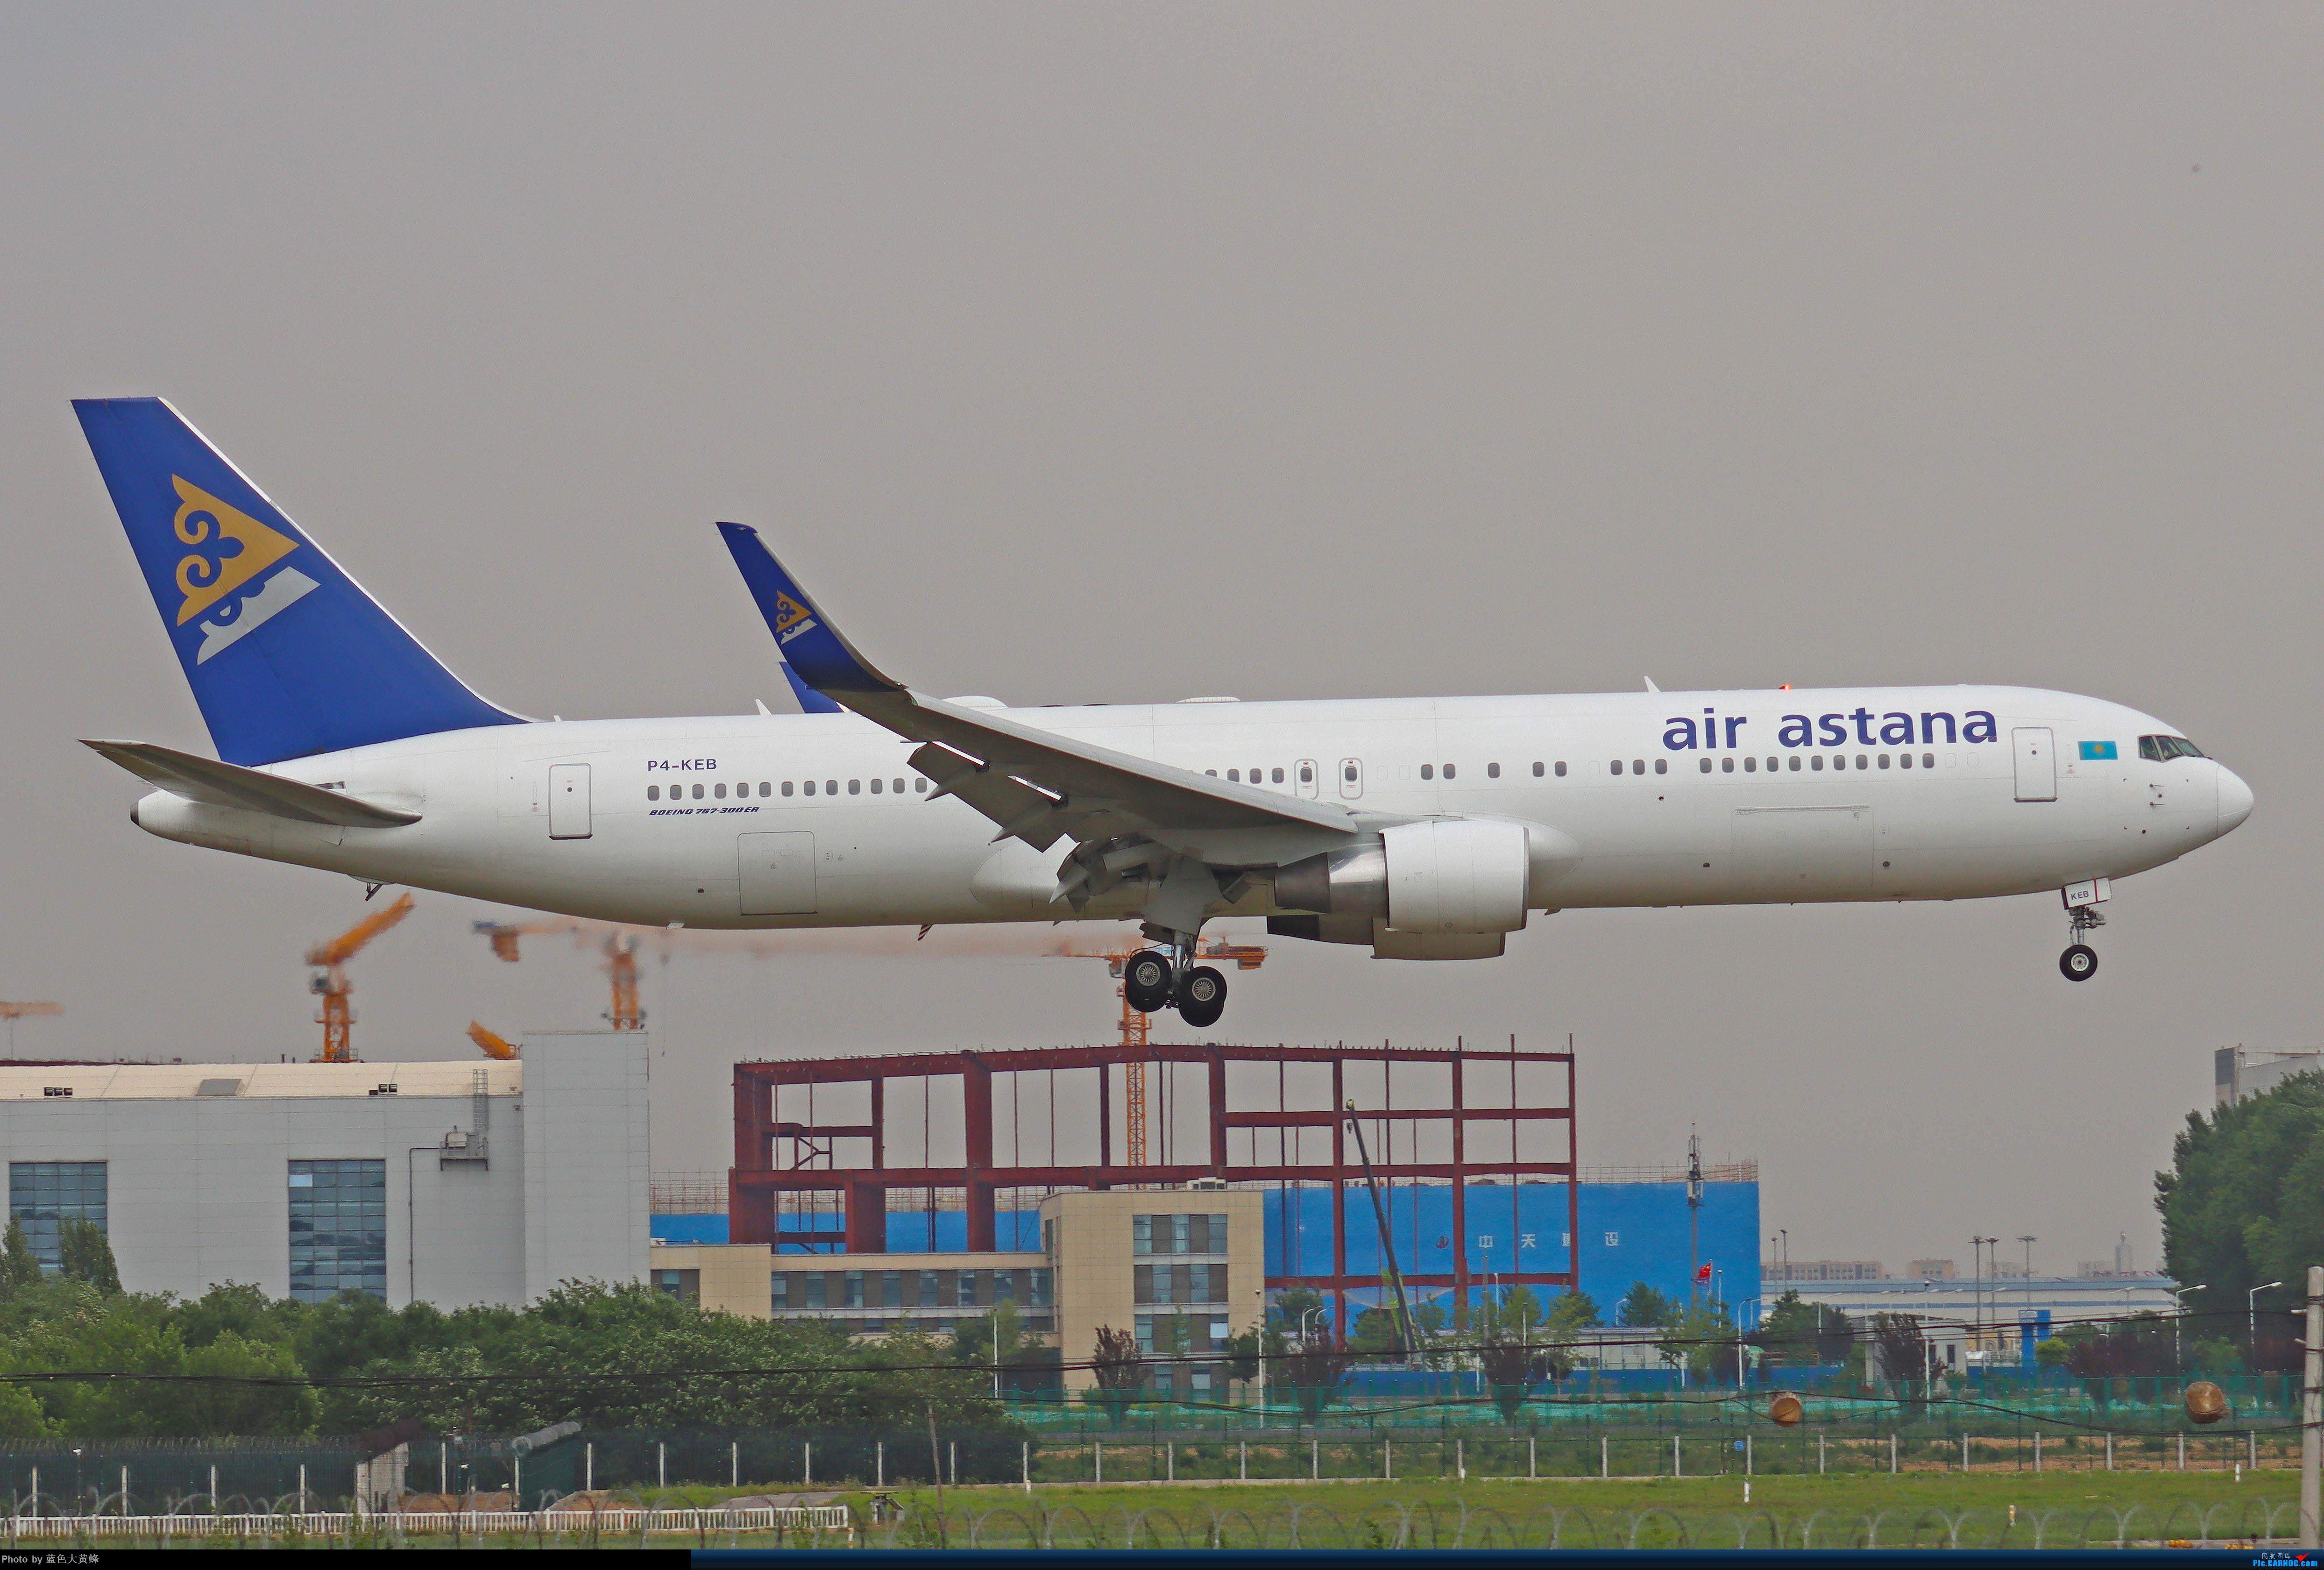 Re:[原创]2020.5.30PEK拍机,偶遇联邦的MD11给18R降落,实属罕见 BOEING 767-300ER P4-KEB 中国北京首都国际机场